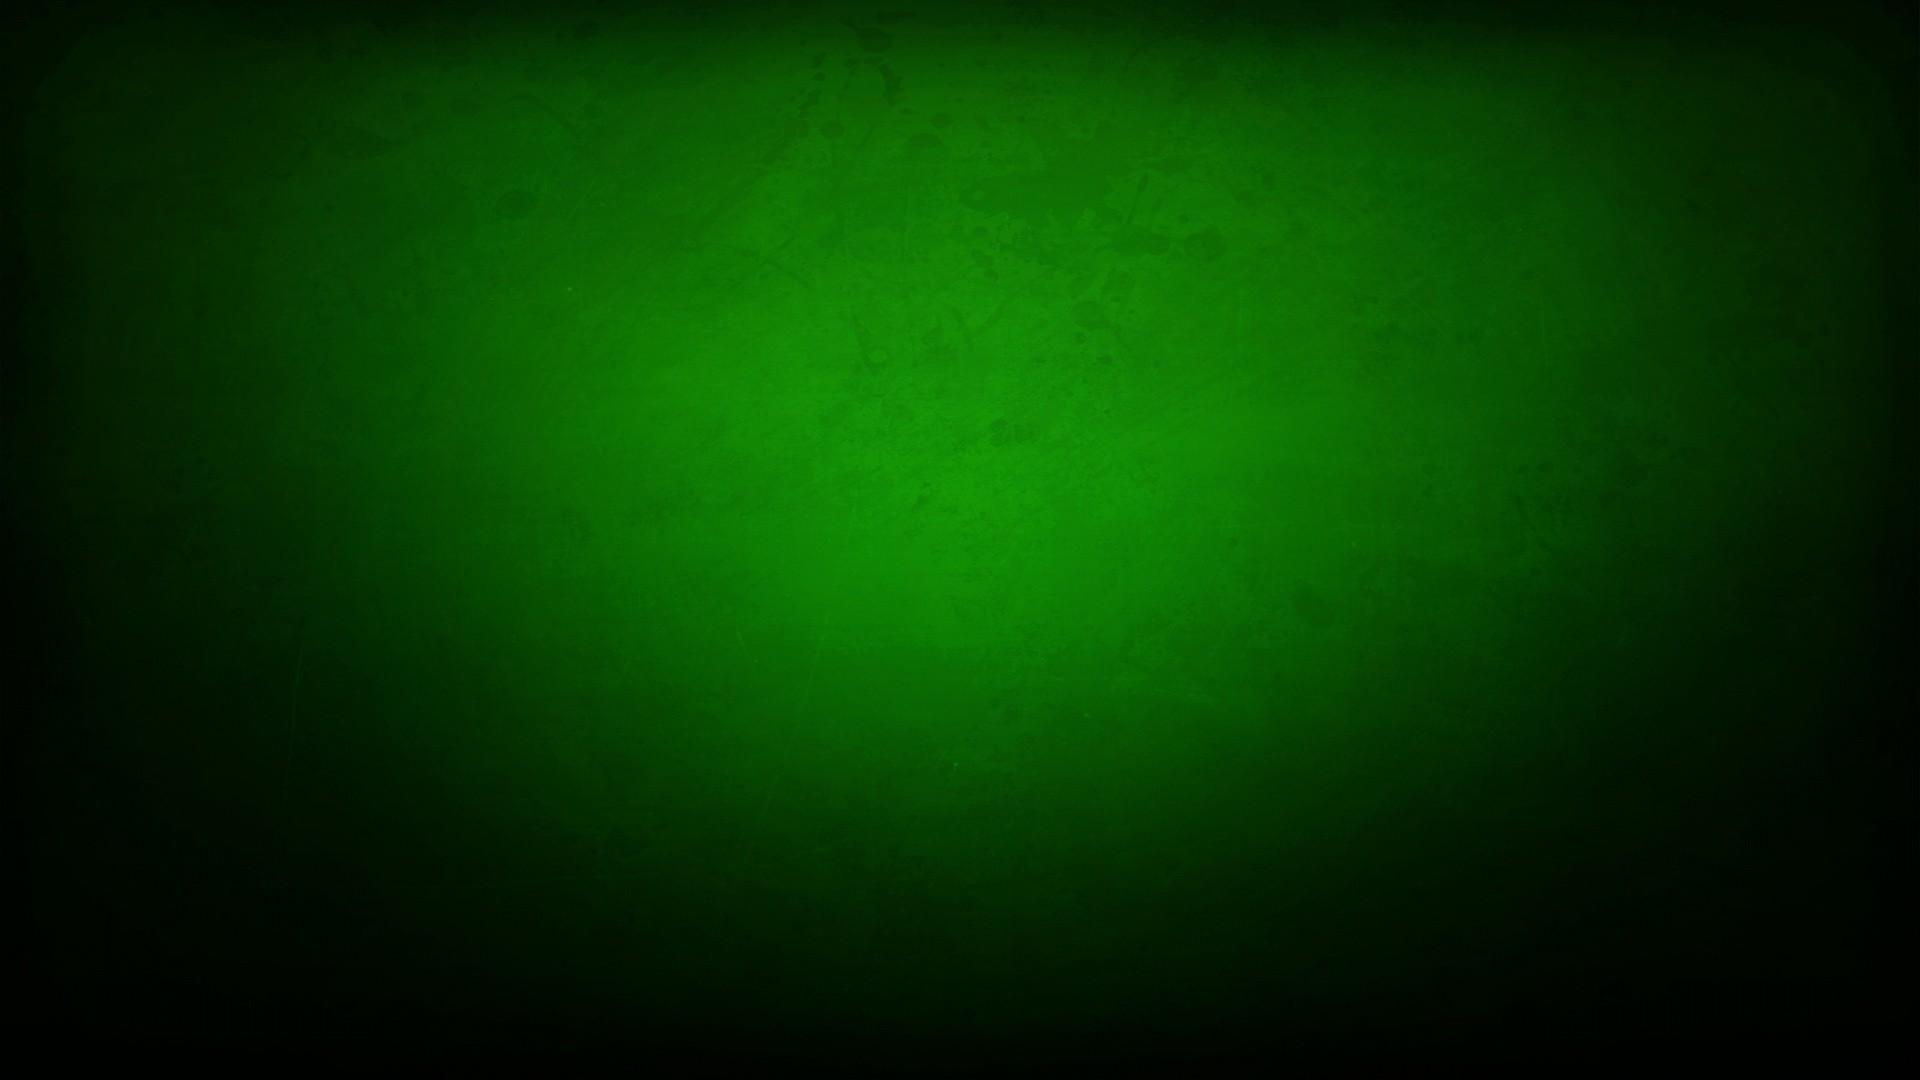 Grunge Green desktop PC and Mac wallpaper